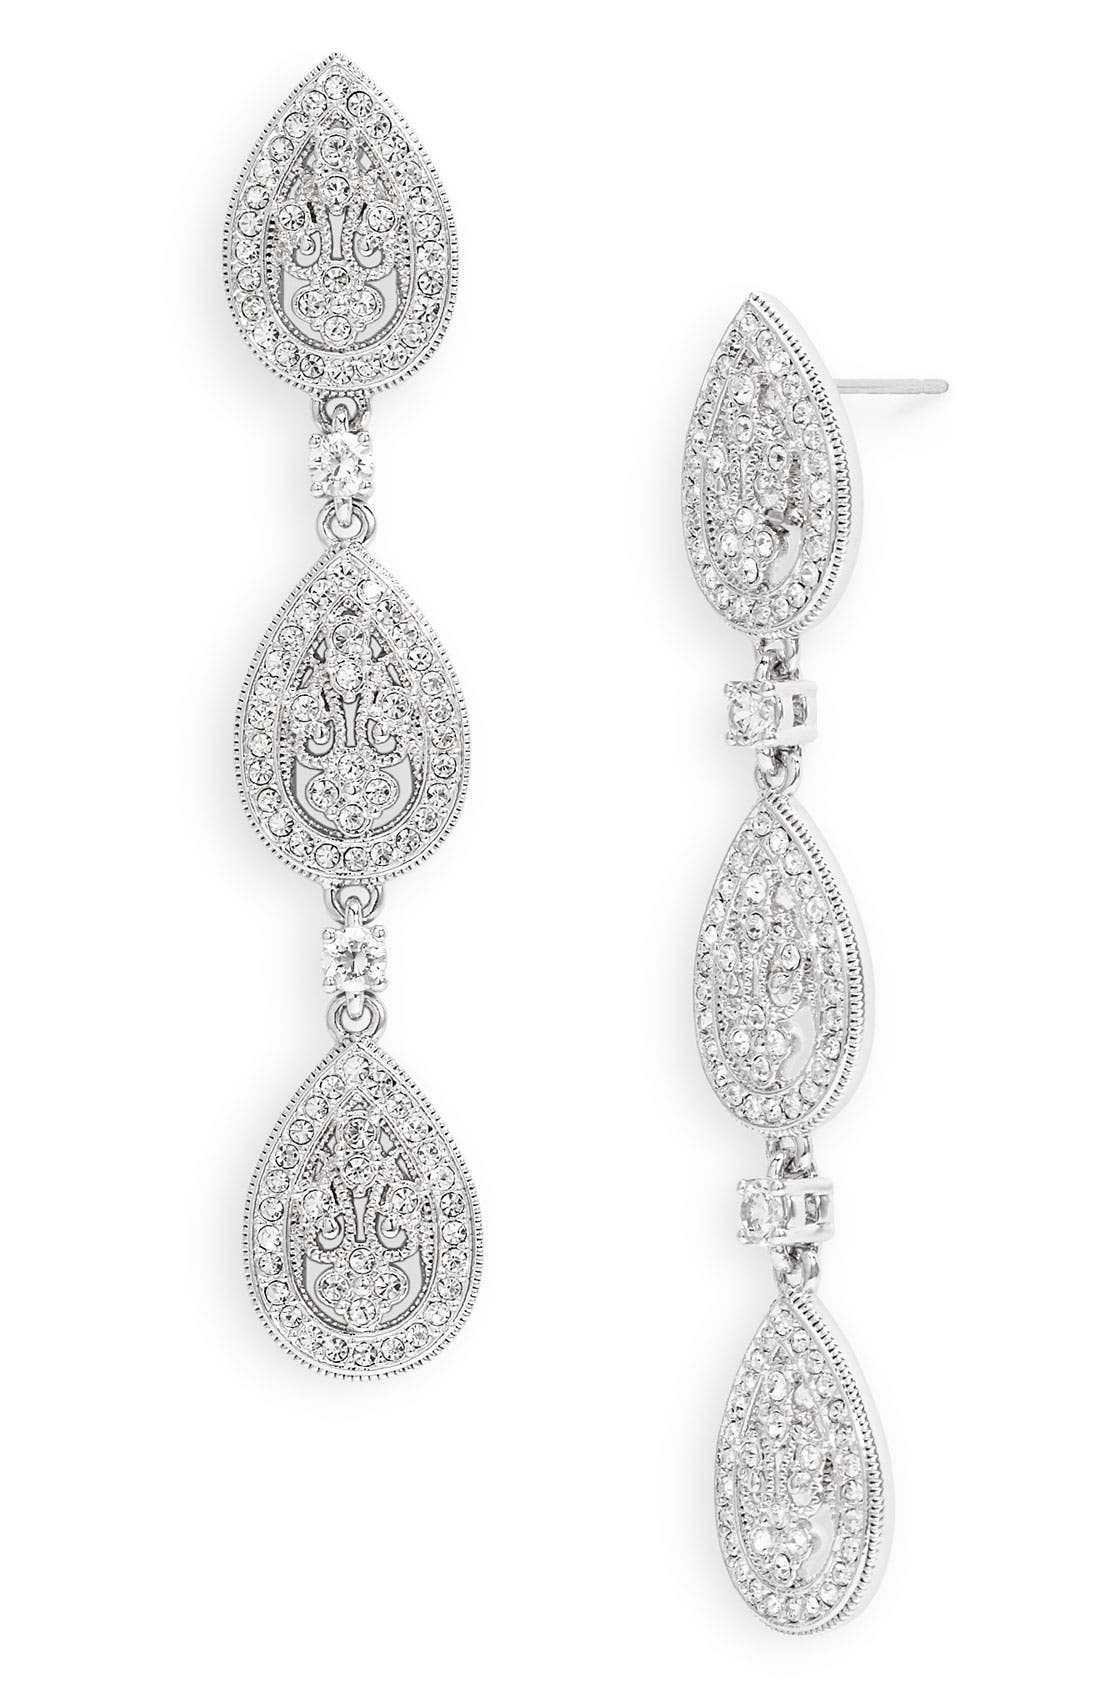 Alternate Image 1 Selected - Nadri Crystal Teardrop Linear Earrings